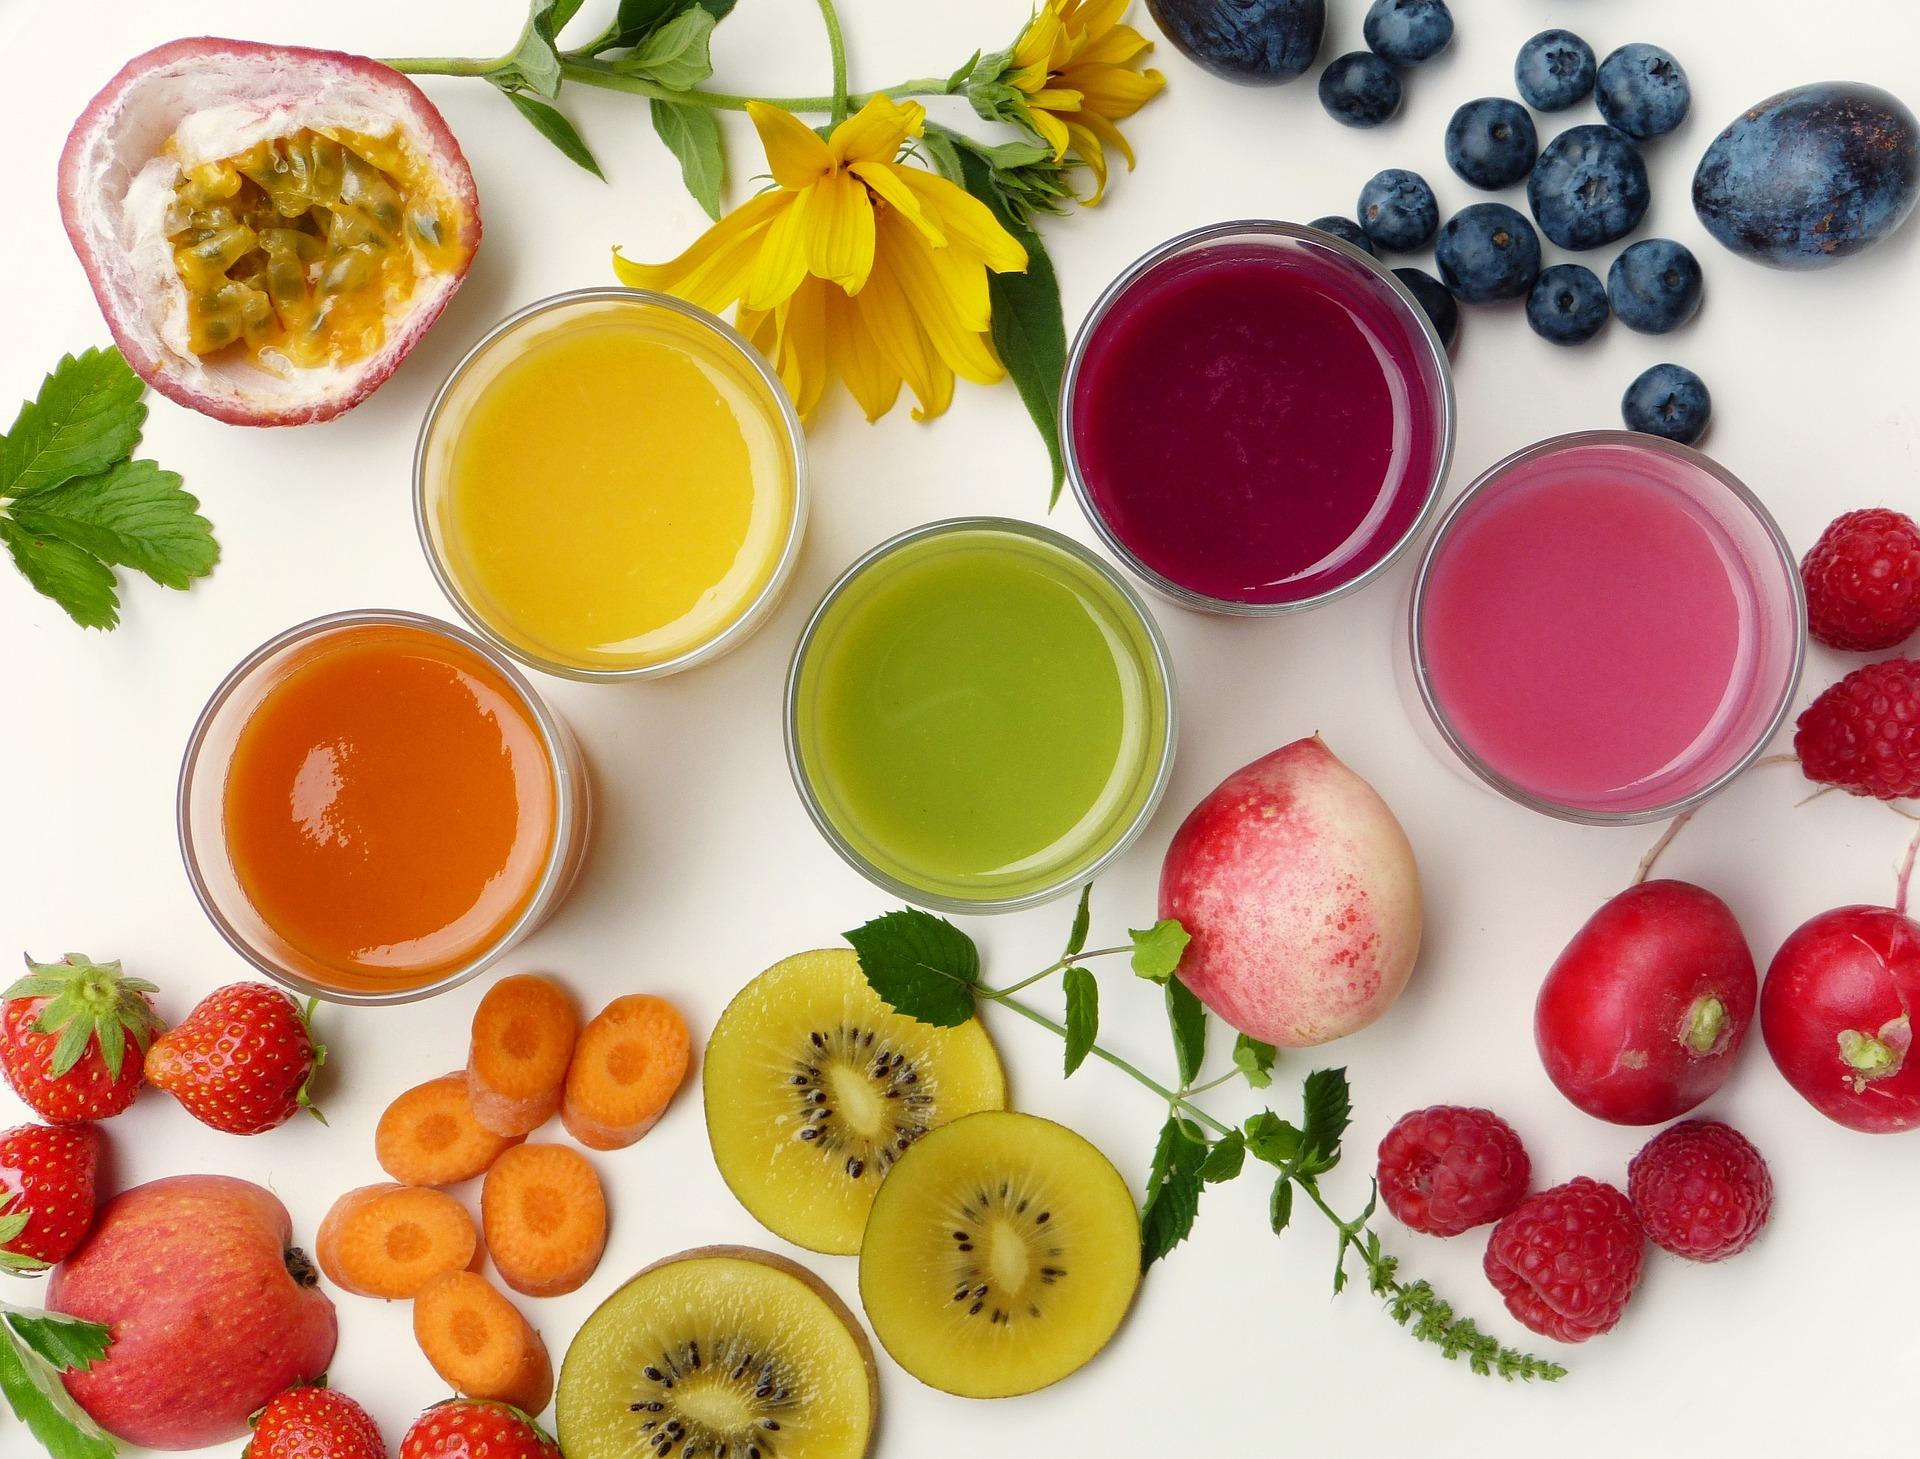 Probiotikum Darmflora intakt halten